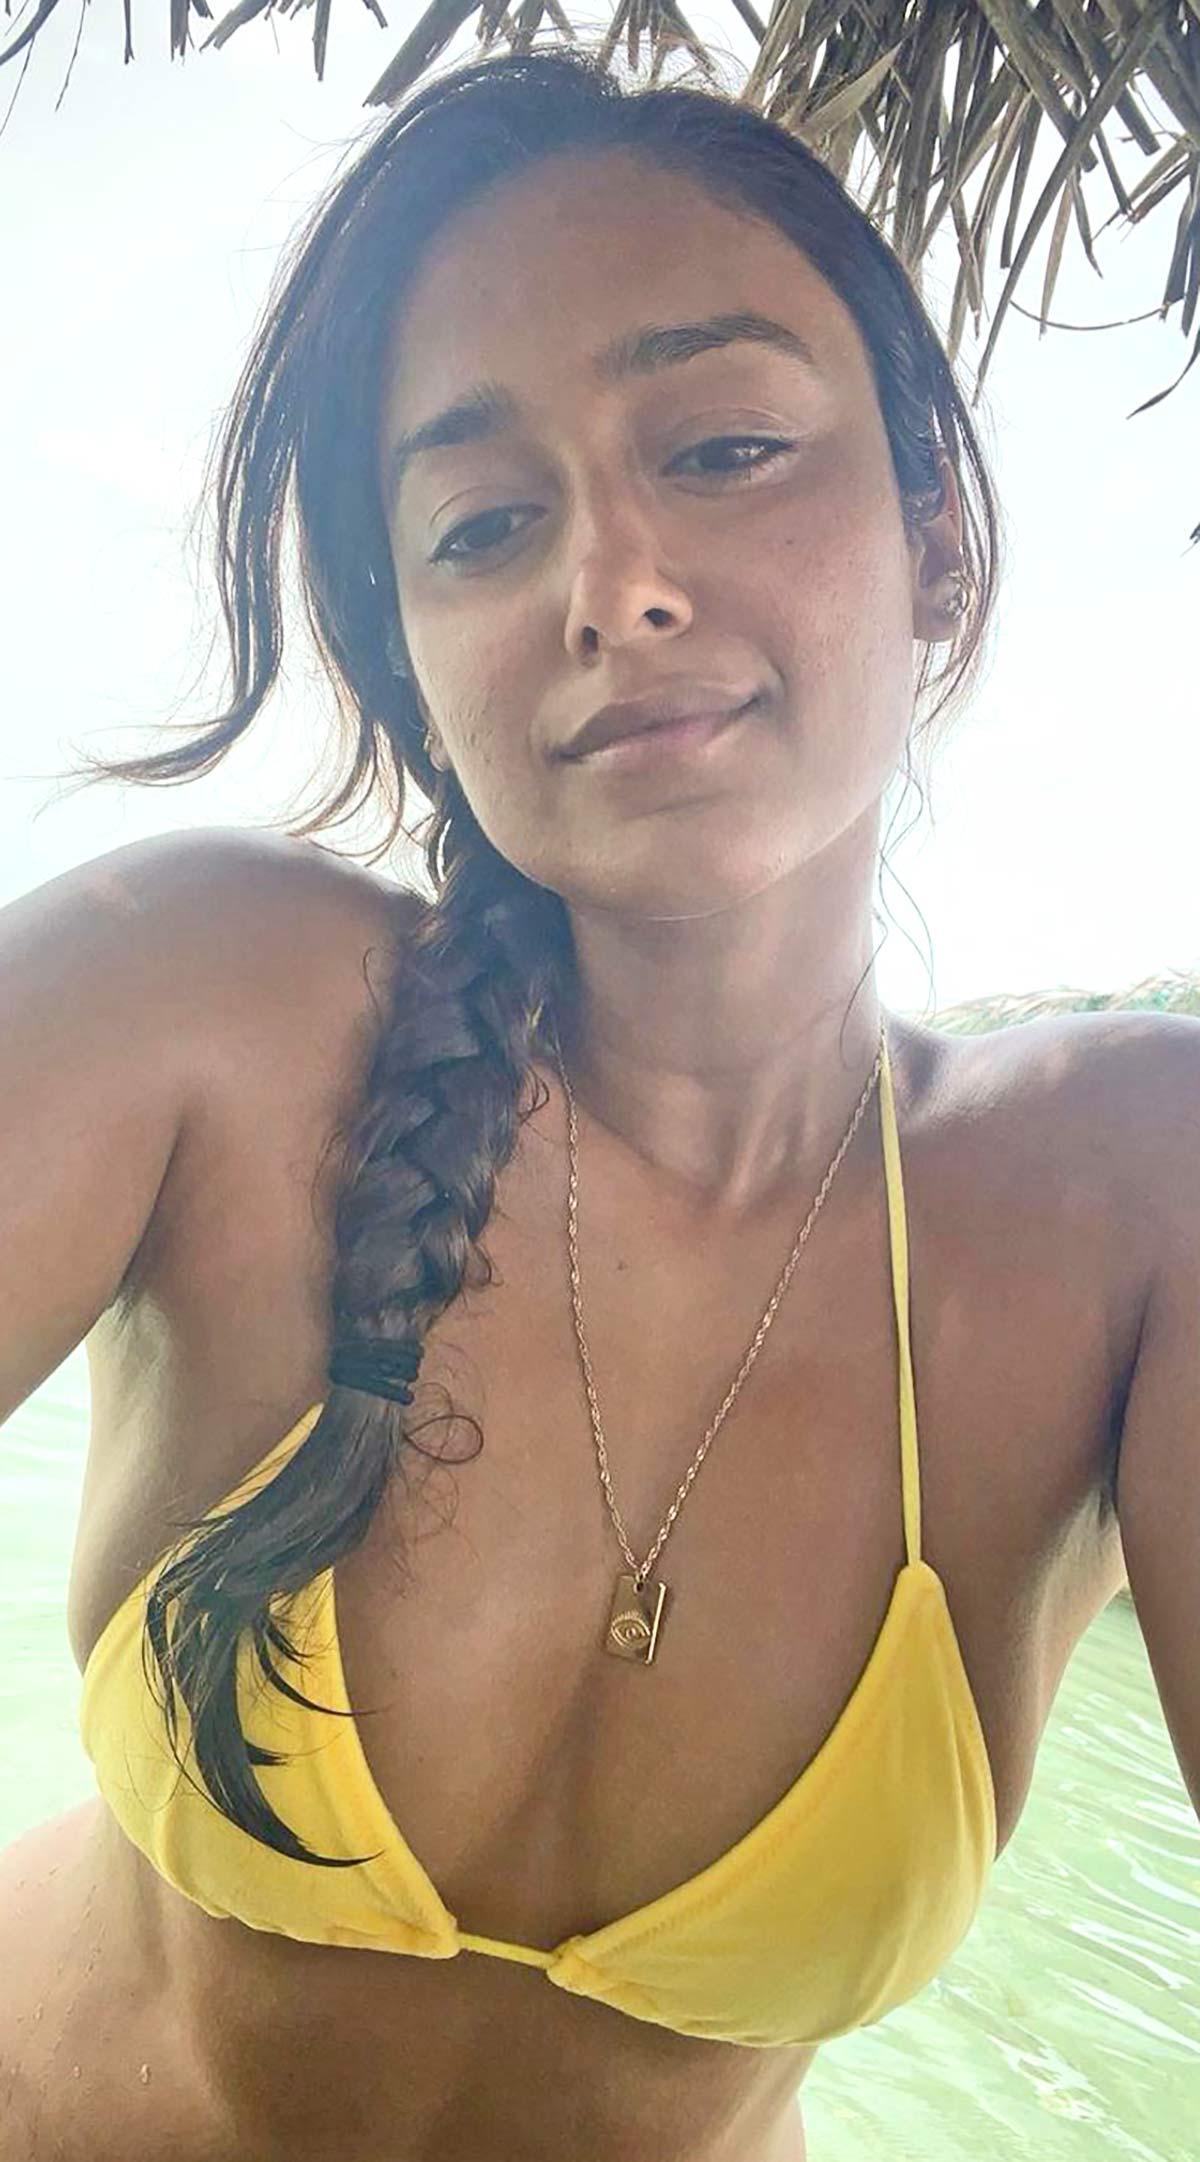 Ileana in #Throwback bikini mode